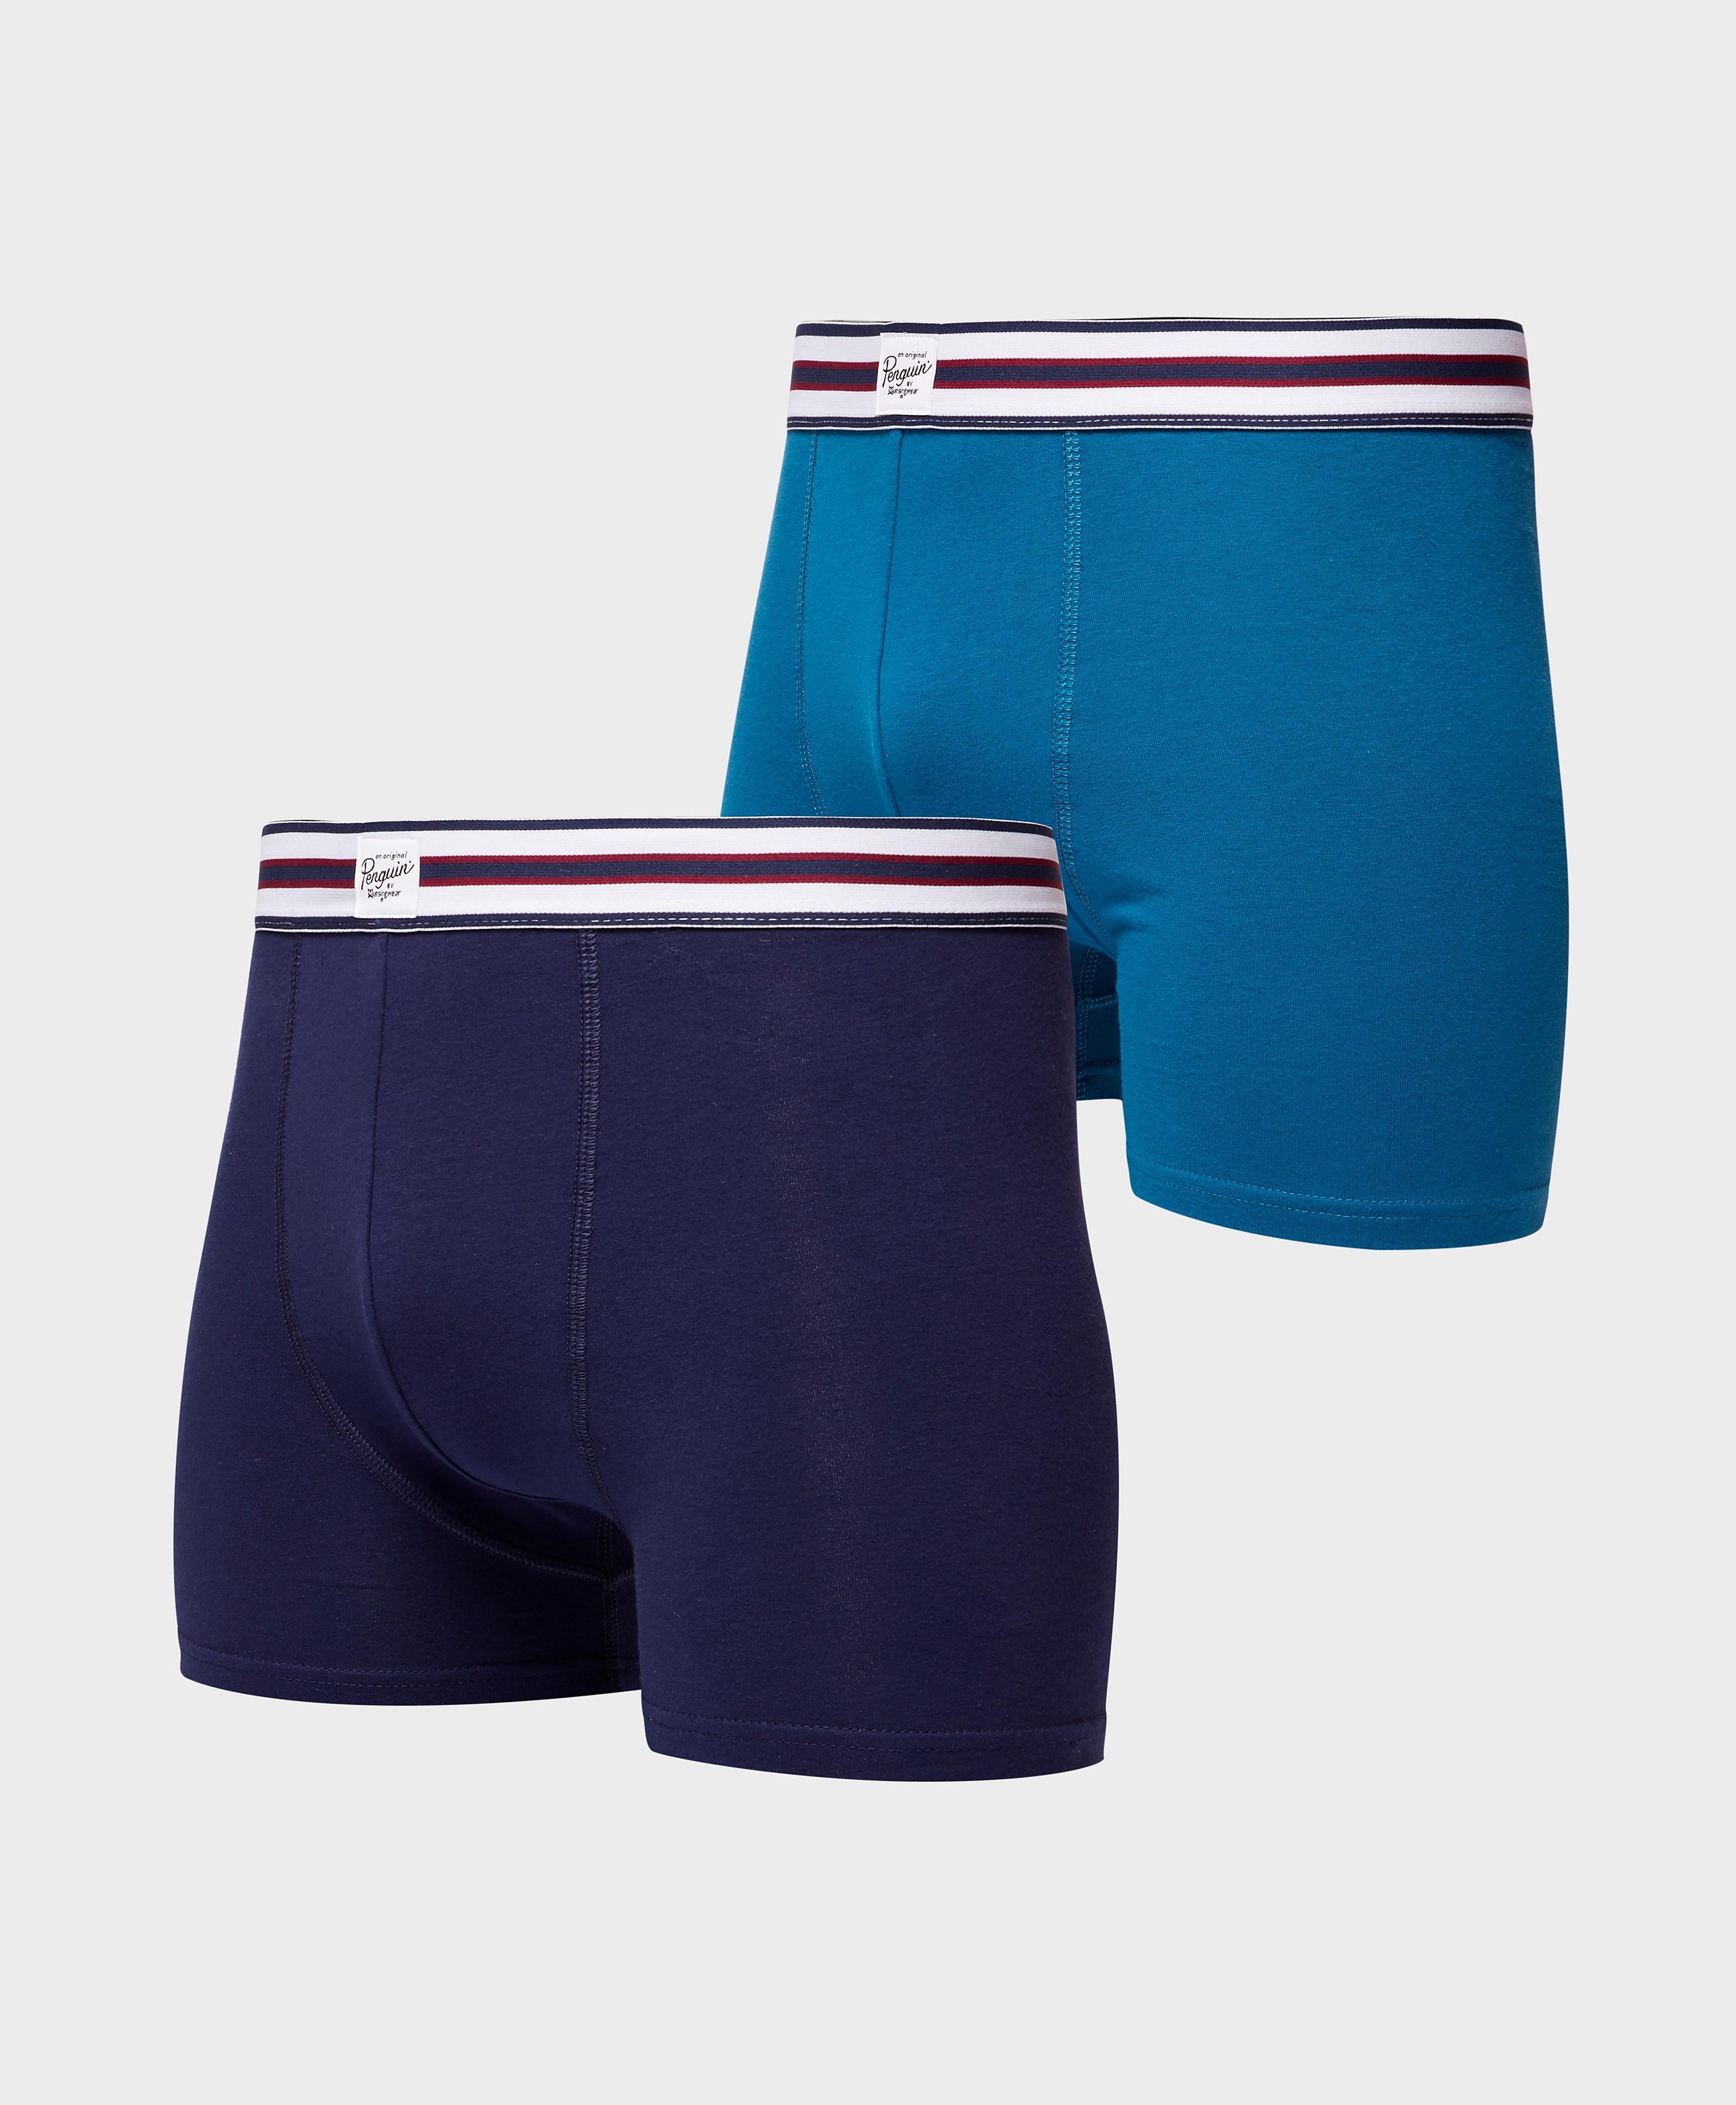 Original Penguin 2-Pack Boxer Shorts